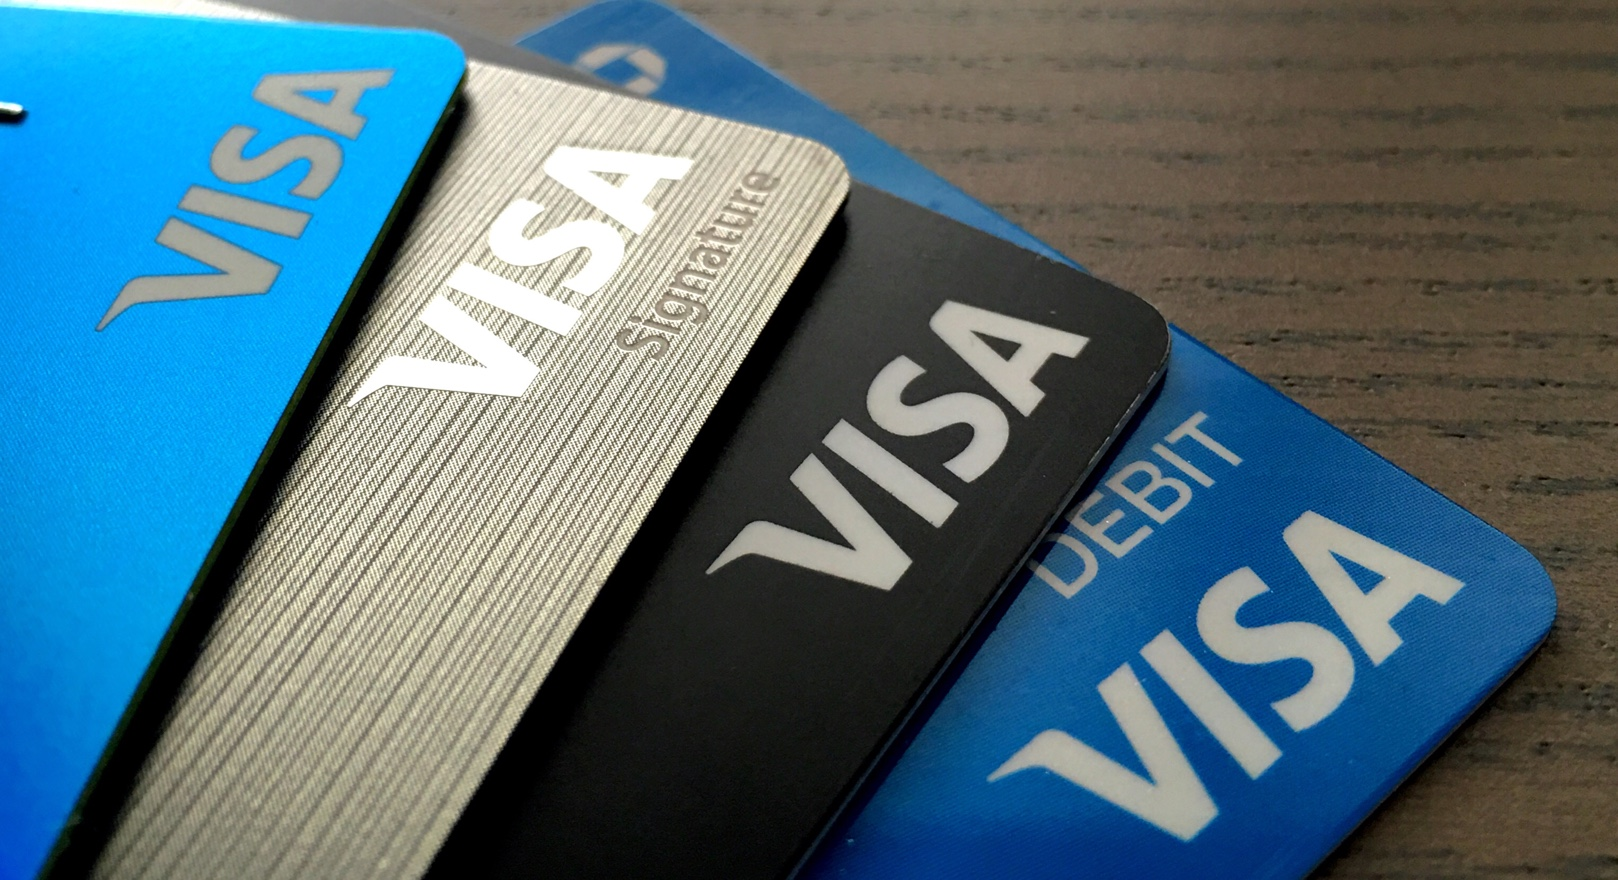 Visa's new developer program has hundreds of APIs for mobile payment solutions